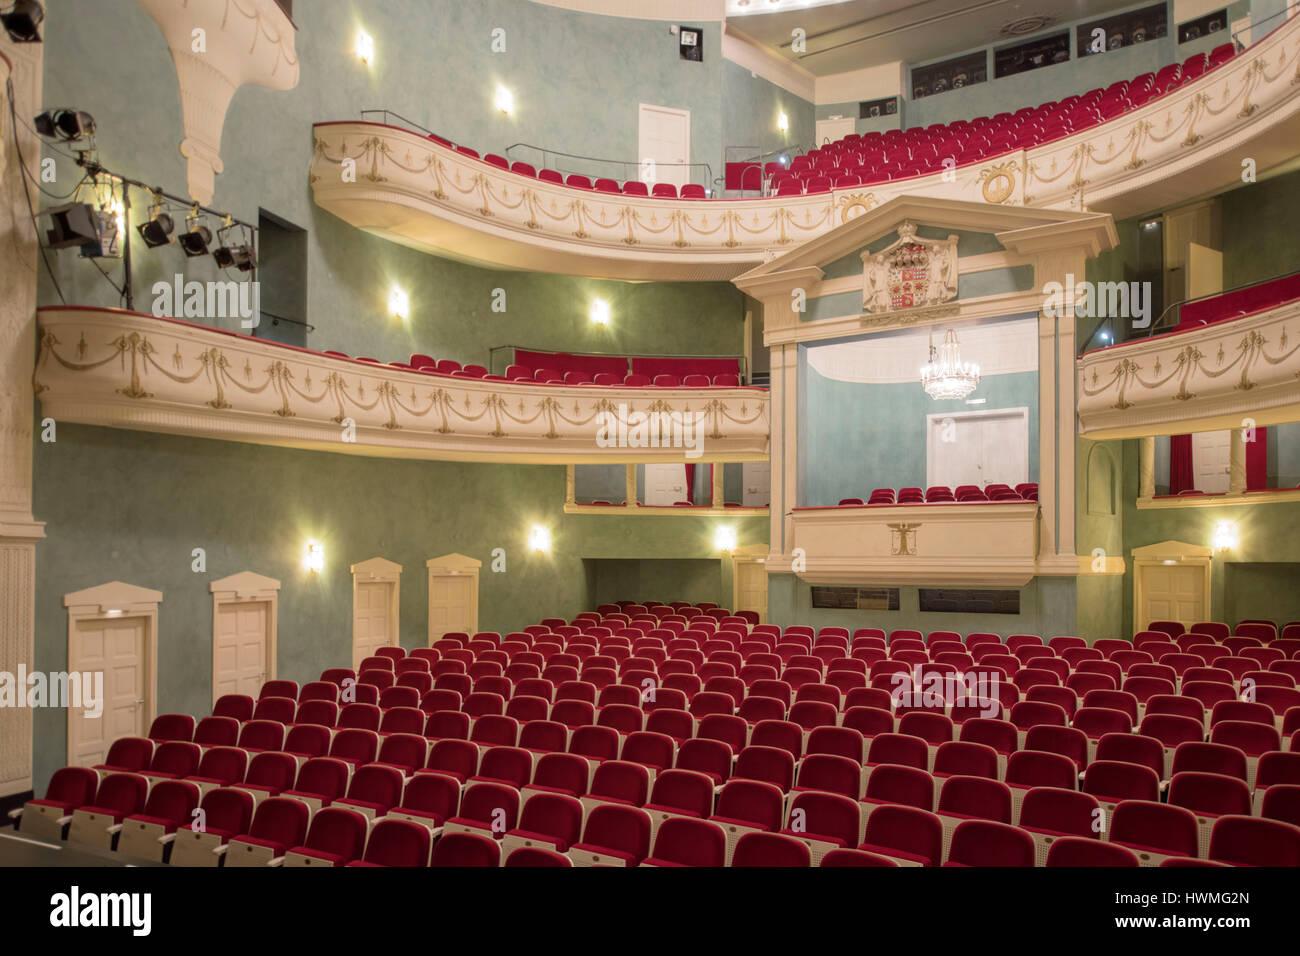 Landestheater Detmold Corona